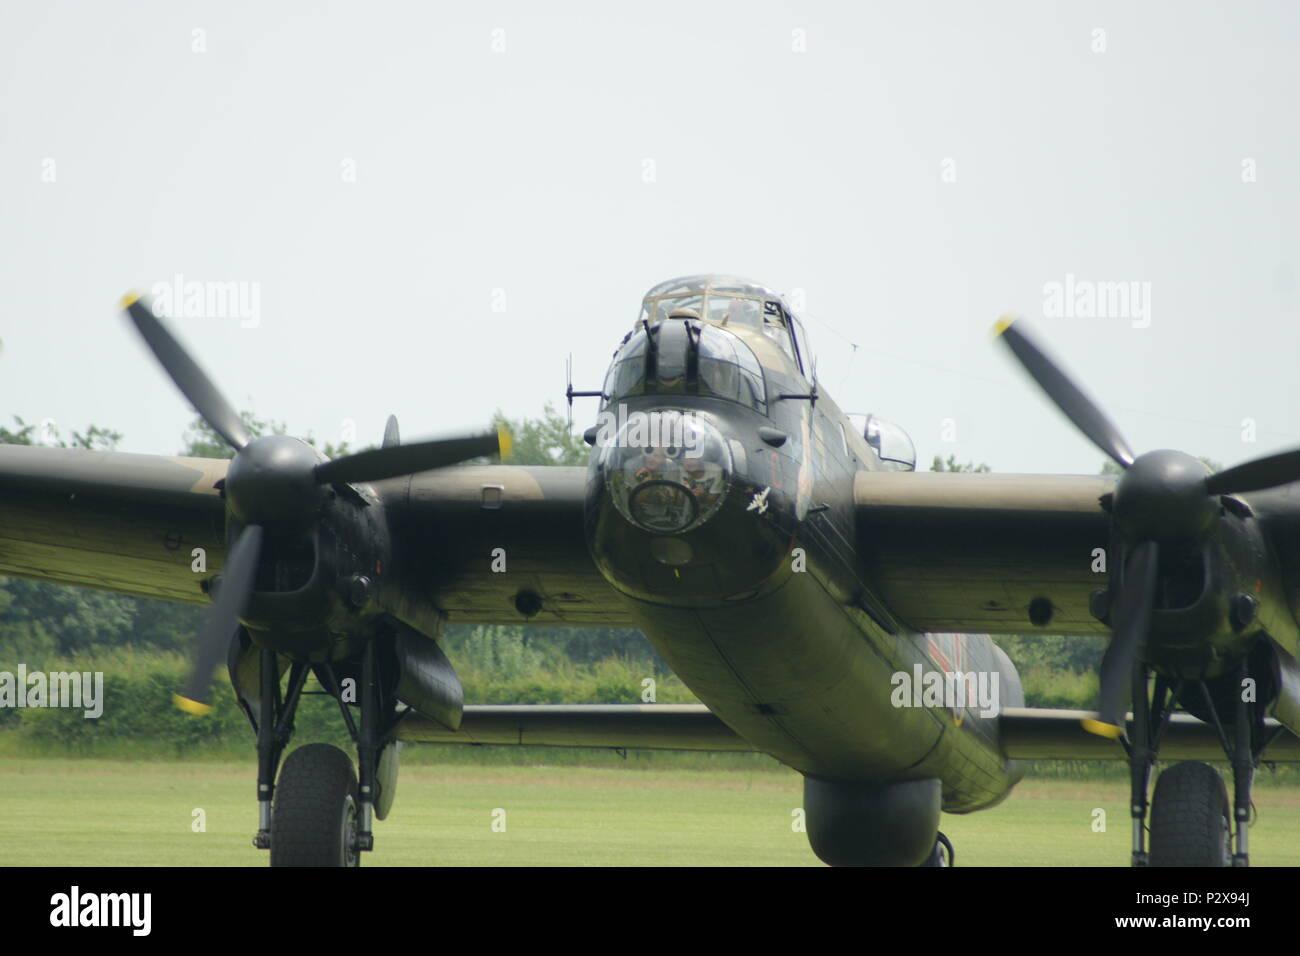 Avro Lancaster, WW2 bomber - Stock Image